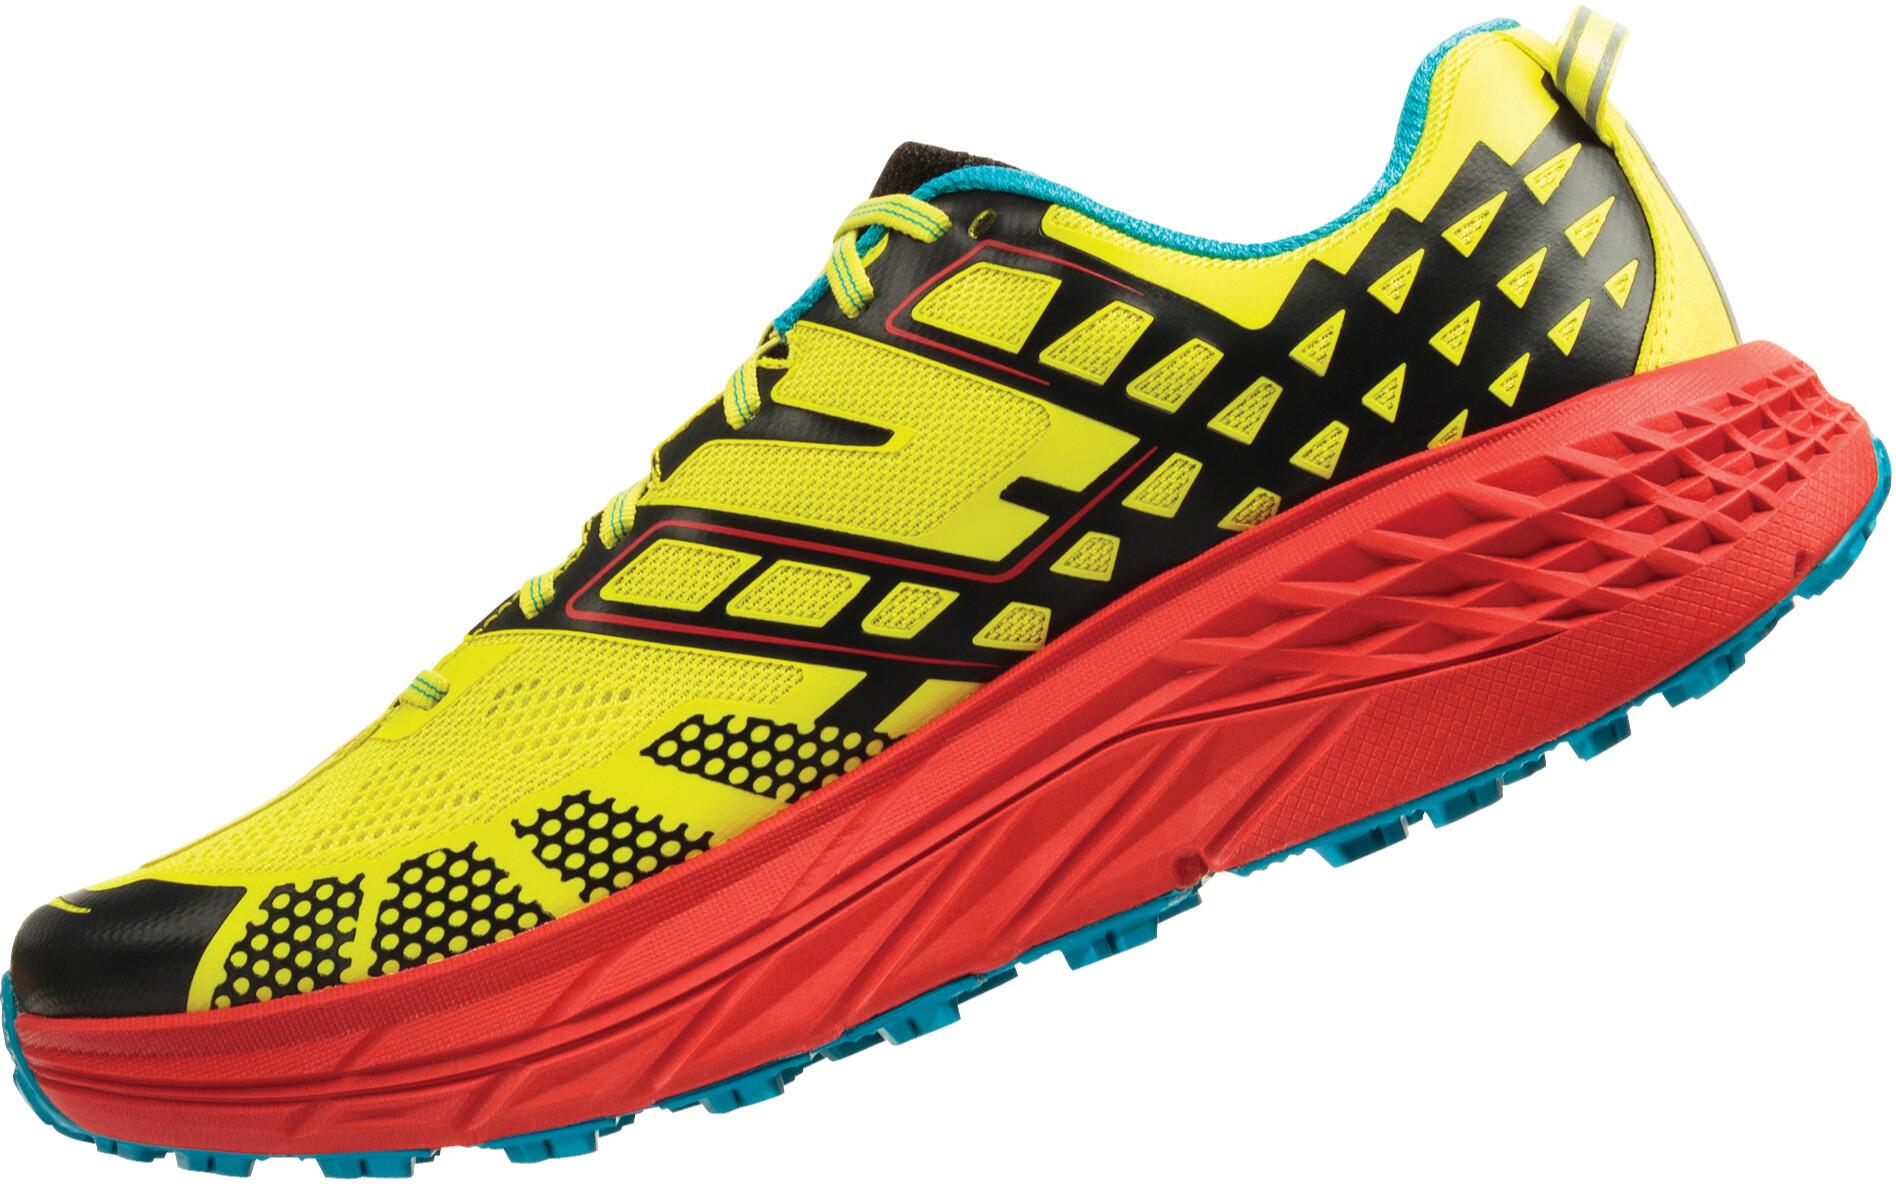 Klettergurt Black Diamond Primrose Test : Hoka one speedgoat running shoes men black evening primrose